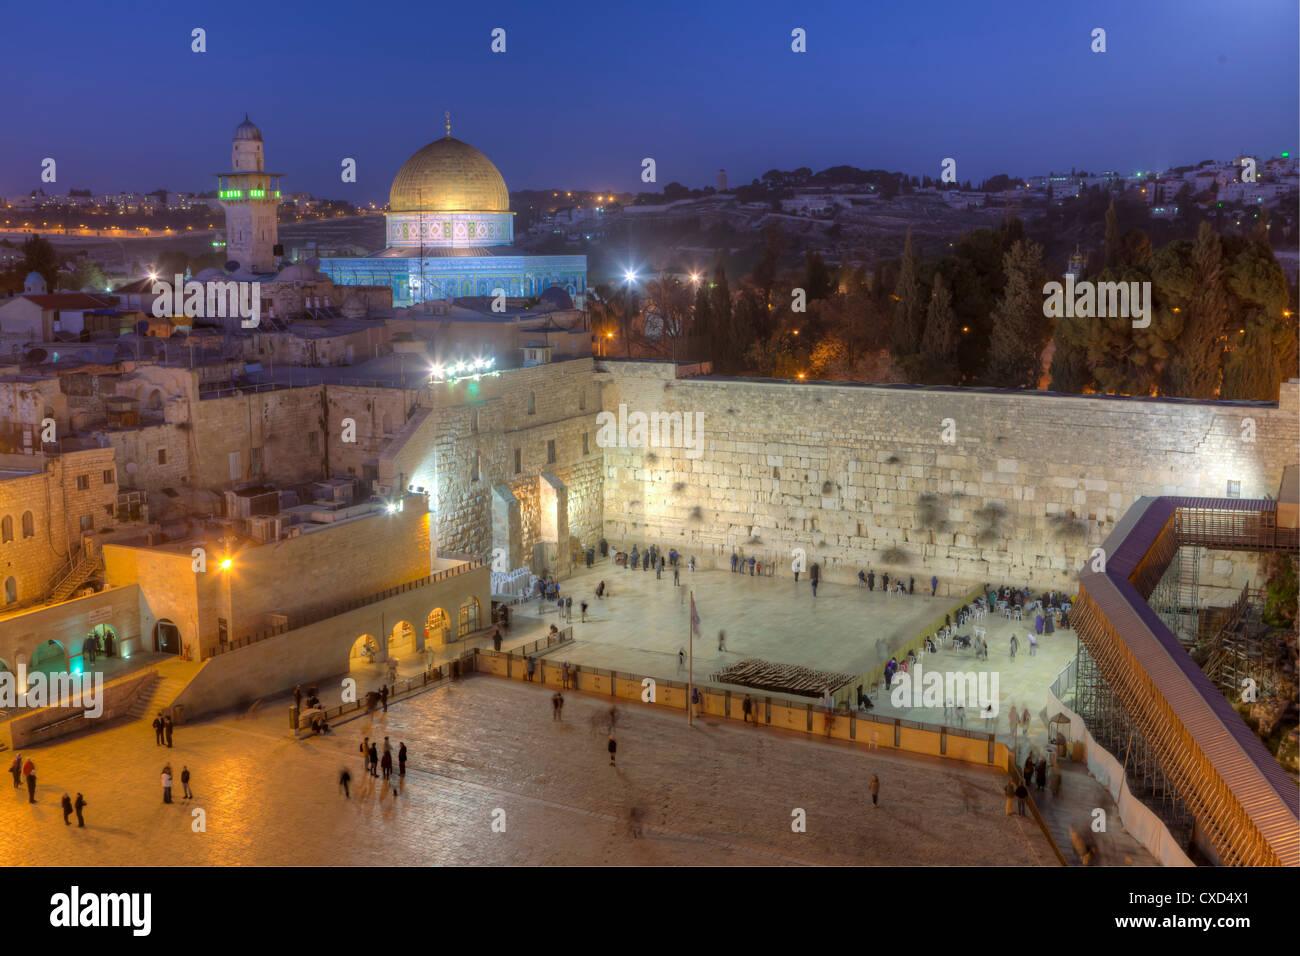 Jewish Quarter of the Western Wall Plaza, Wailing Wall, Old City, UNESCO World Heritge Site, Jerusalem, Israel - Stock Image